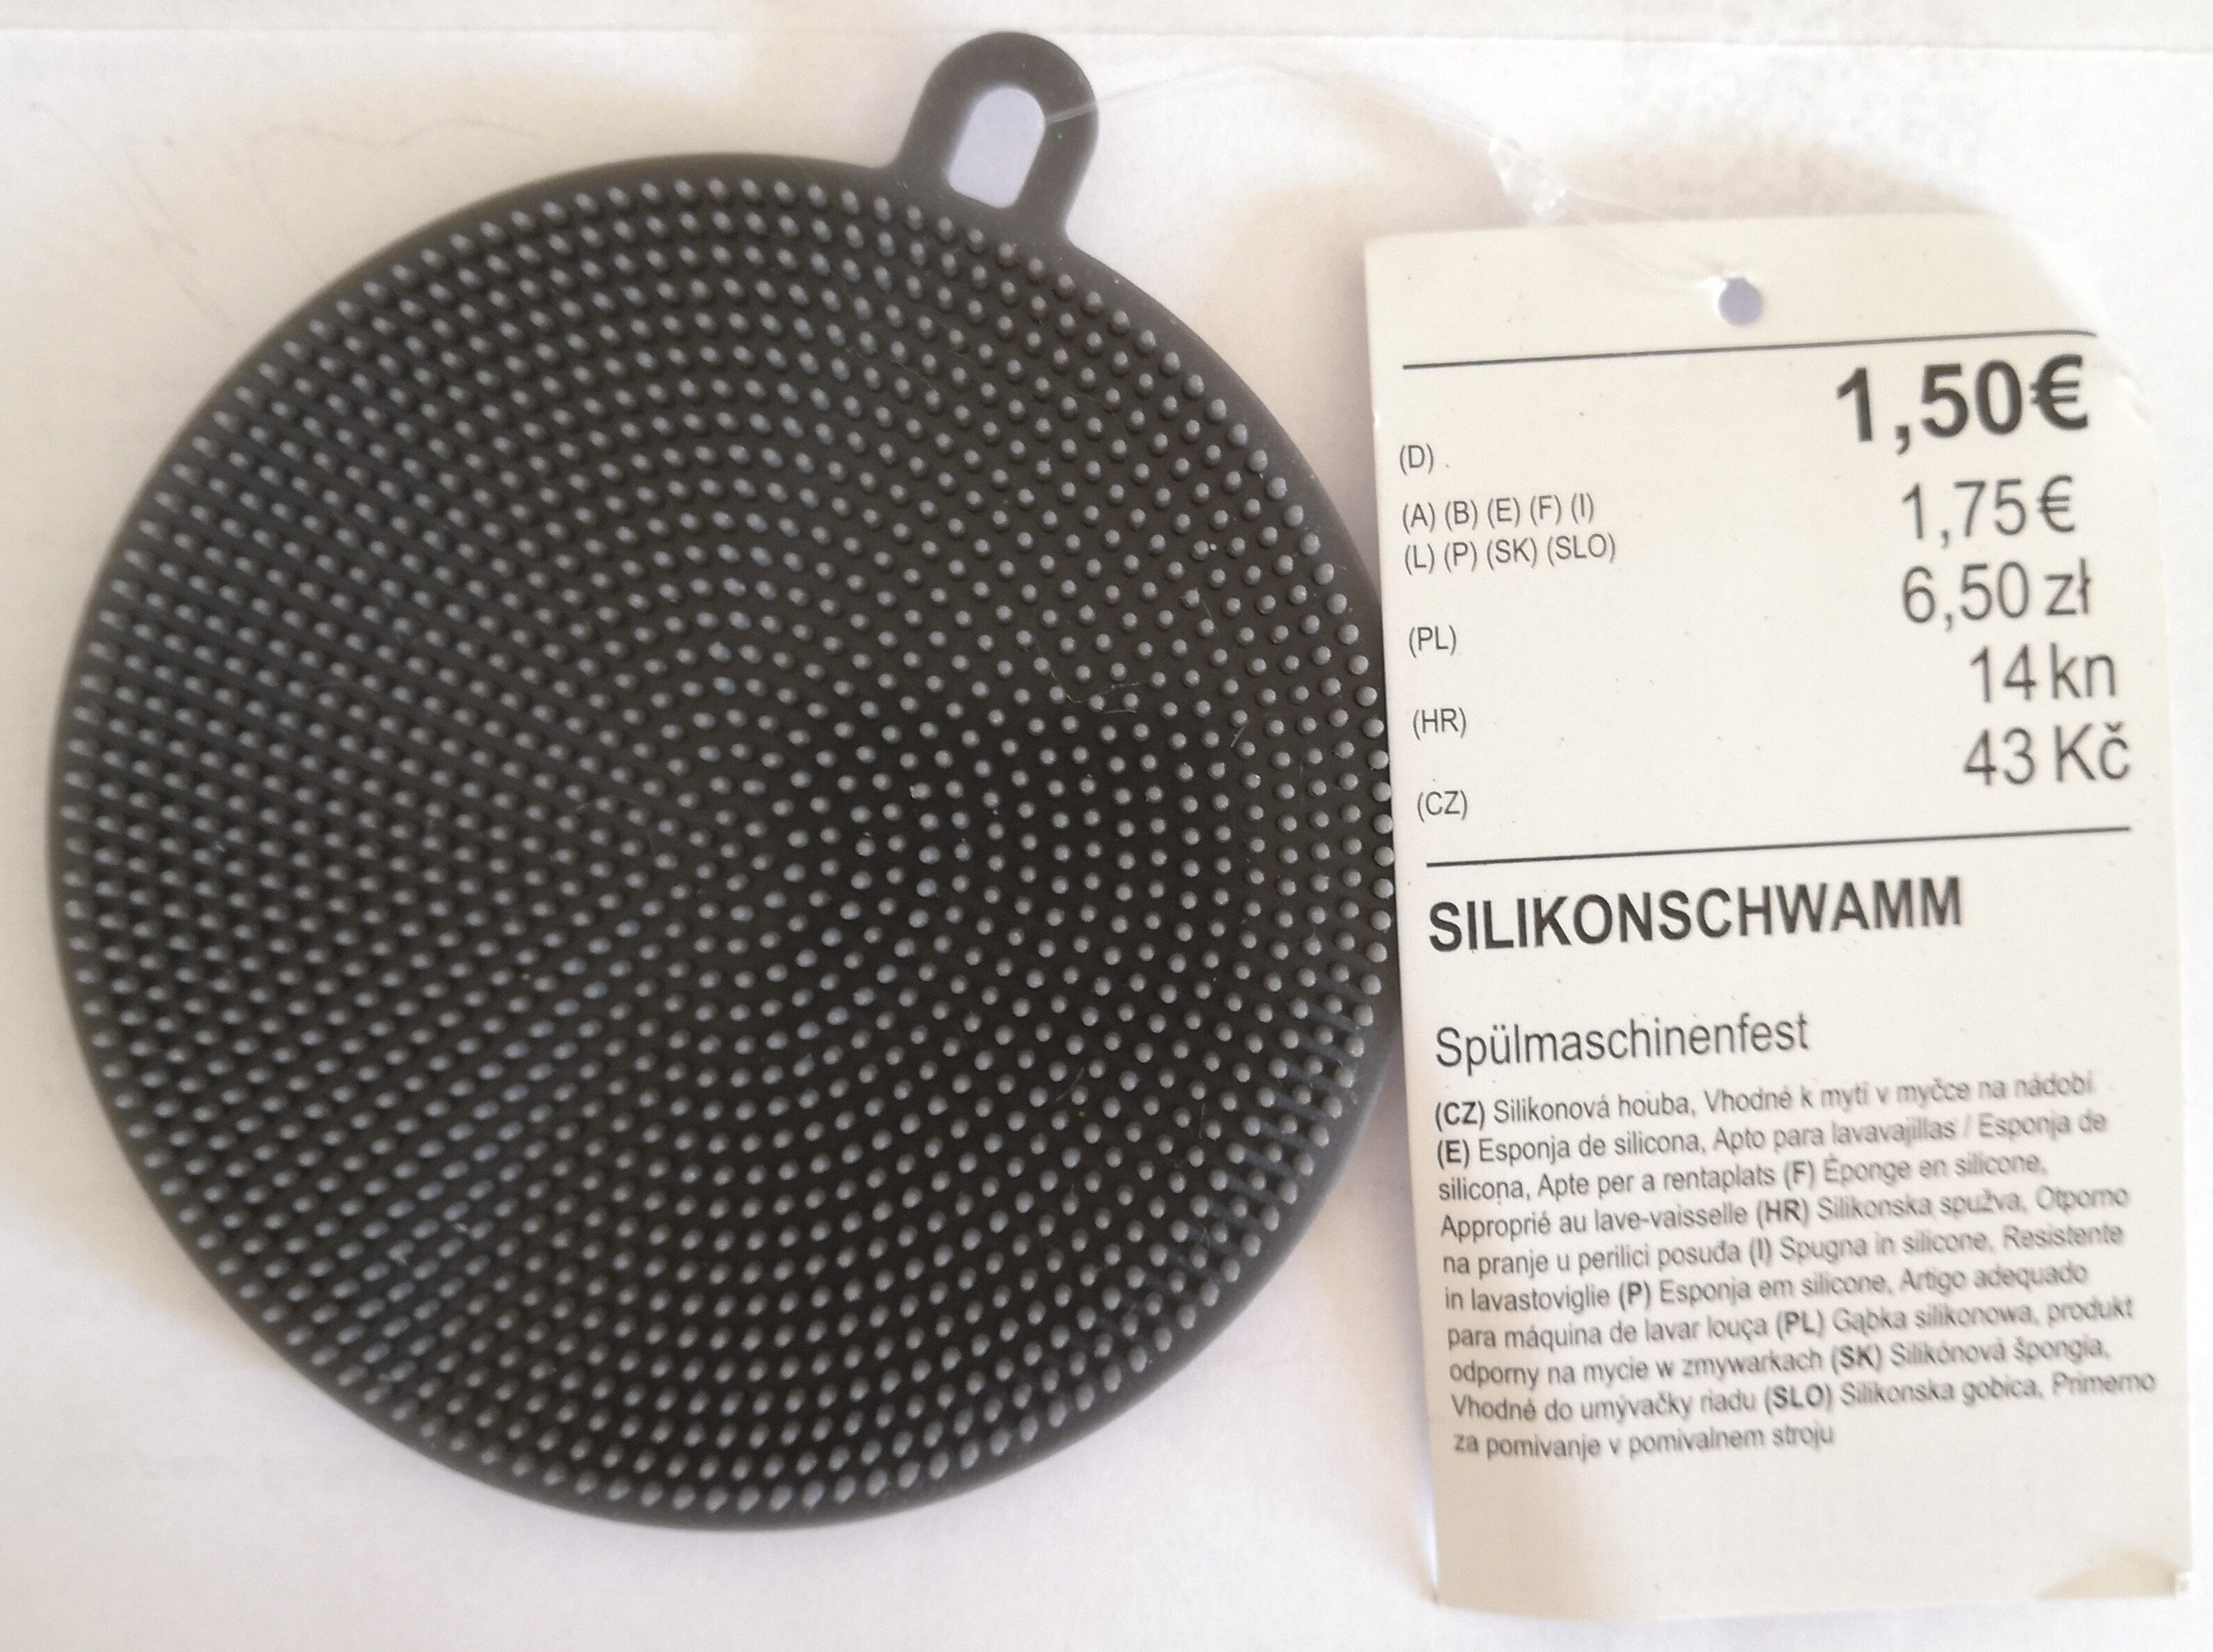 Silikonschwamm - Product - de